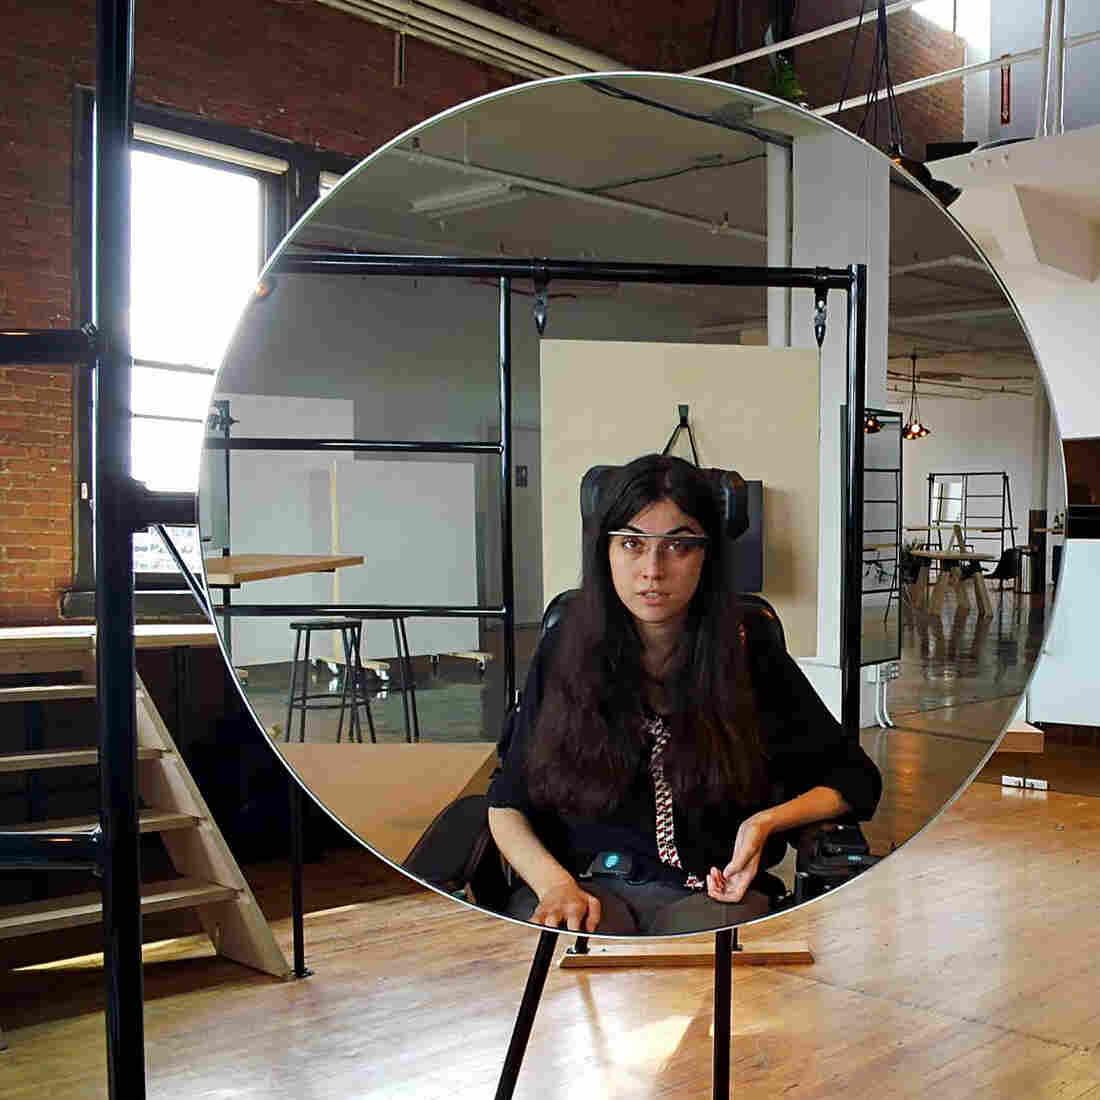 Alex Blaszczuk used Google Glass to shoot this self portait.